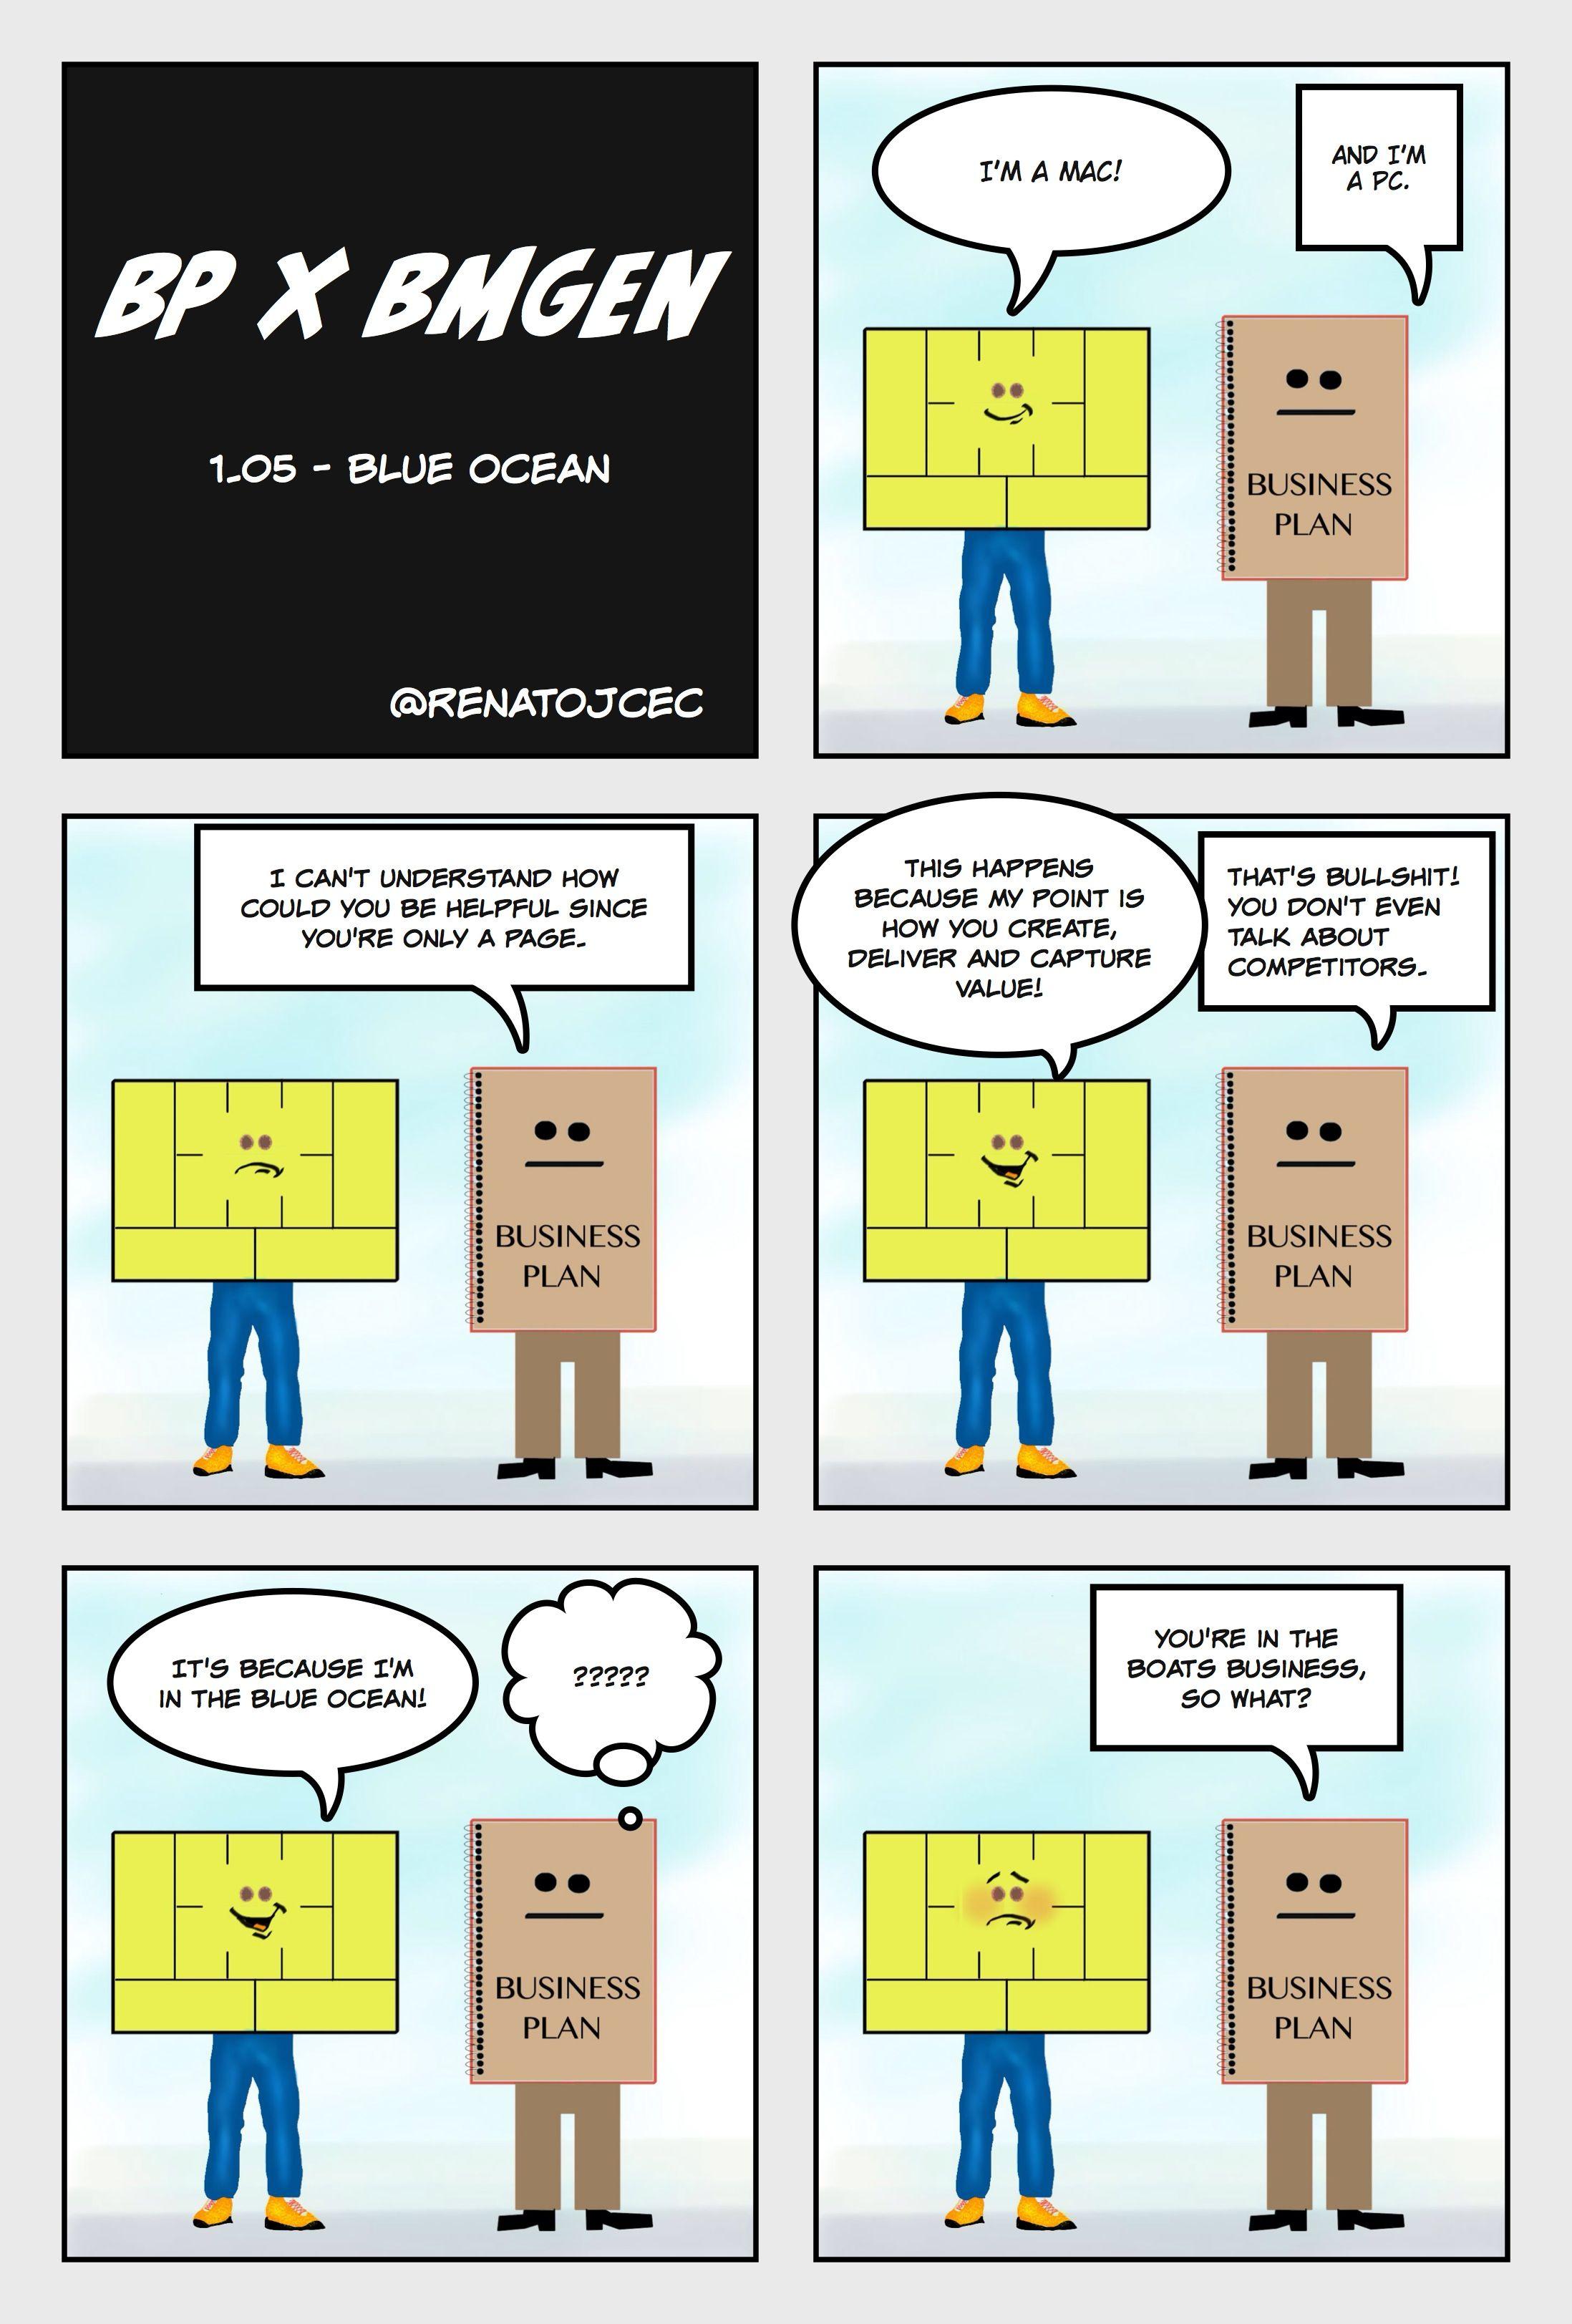 BP vs #bmgen 1.05 - Blue Ocean - now @ #BMGen Comicshttp://materiais.bmgenbrasil.com/bmgen-comics-en #custdev #leanstartup